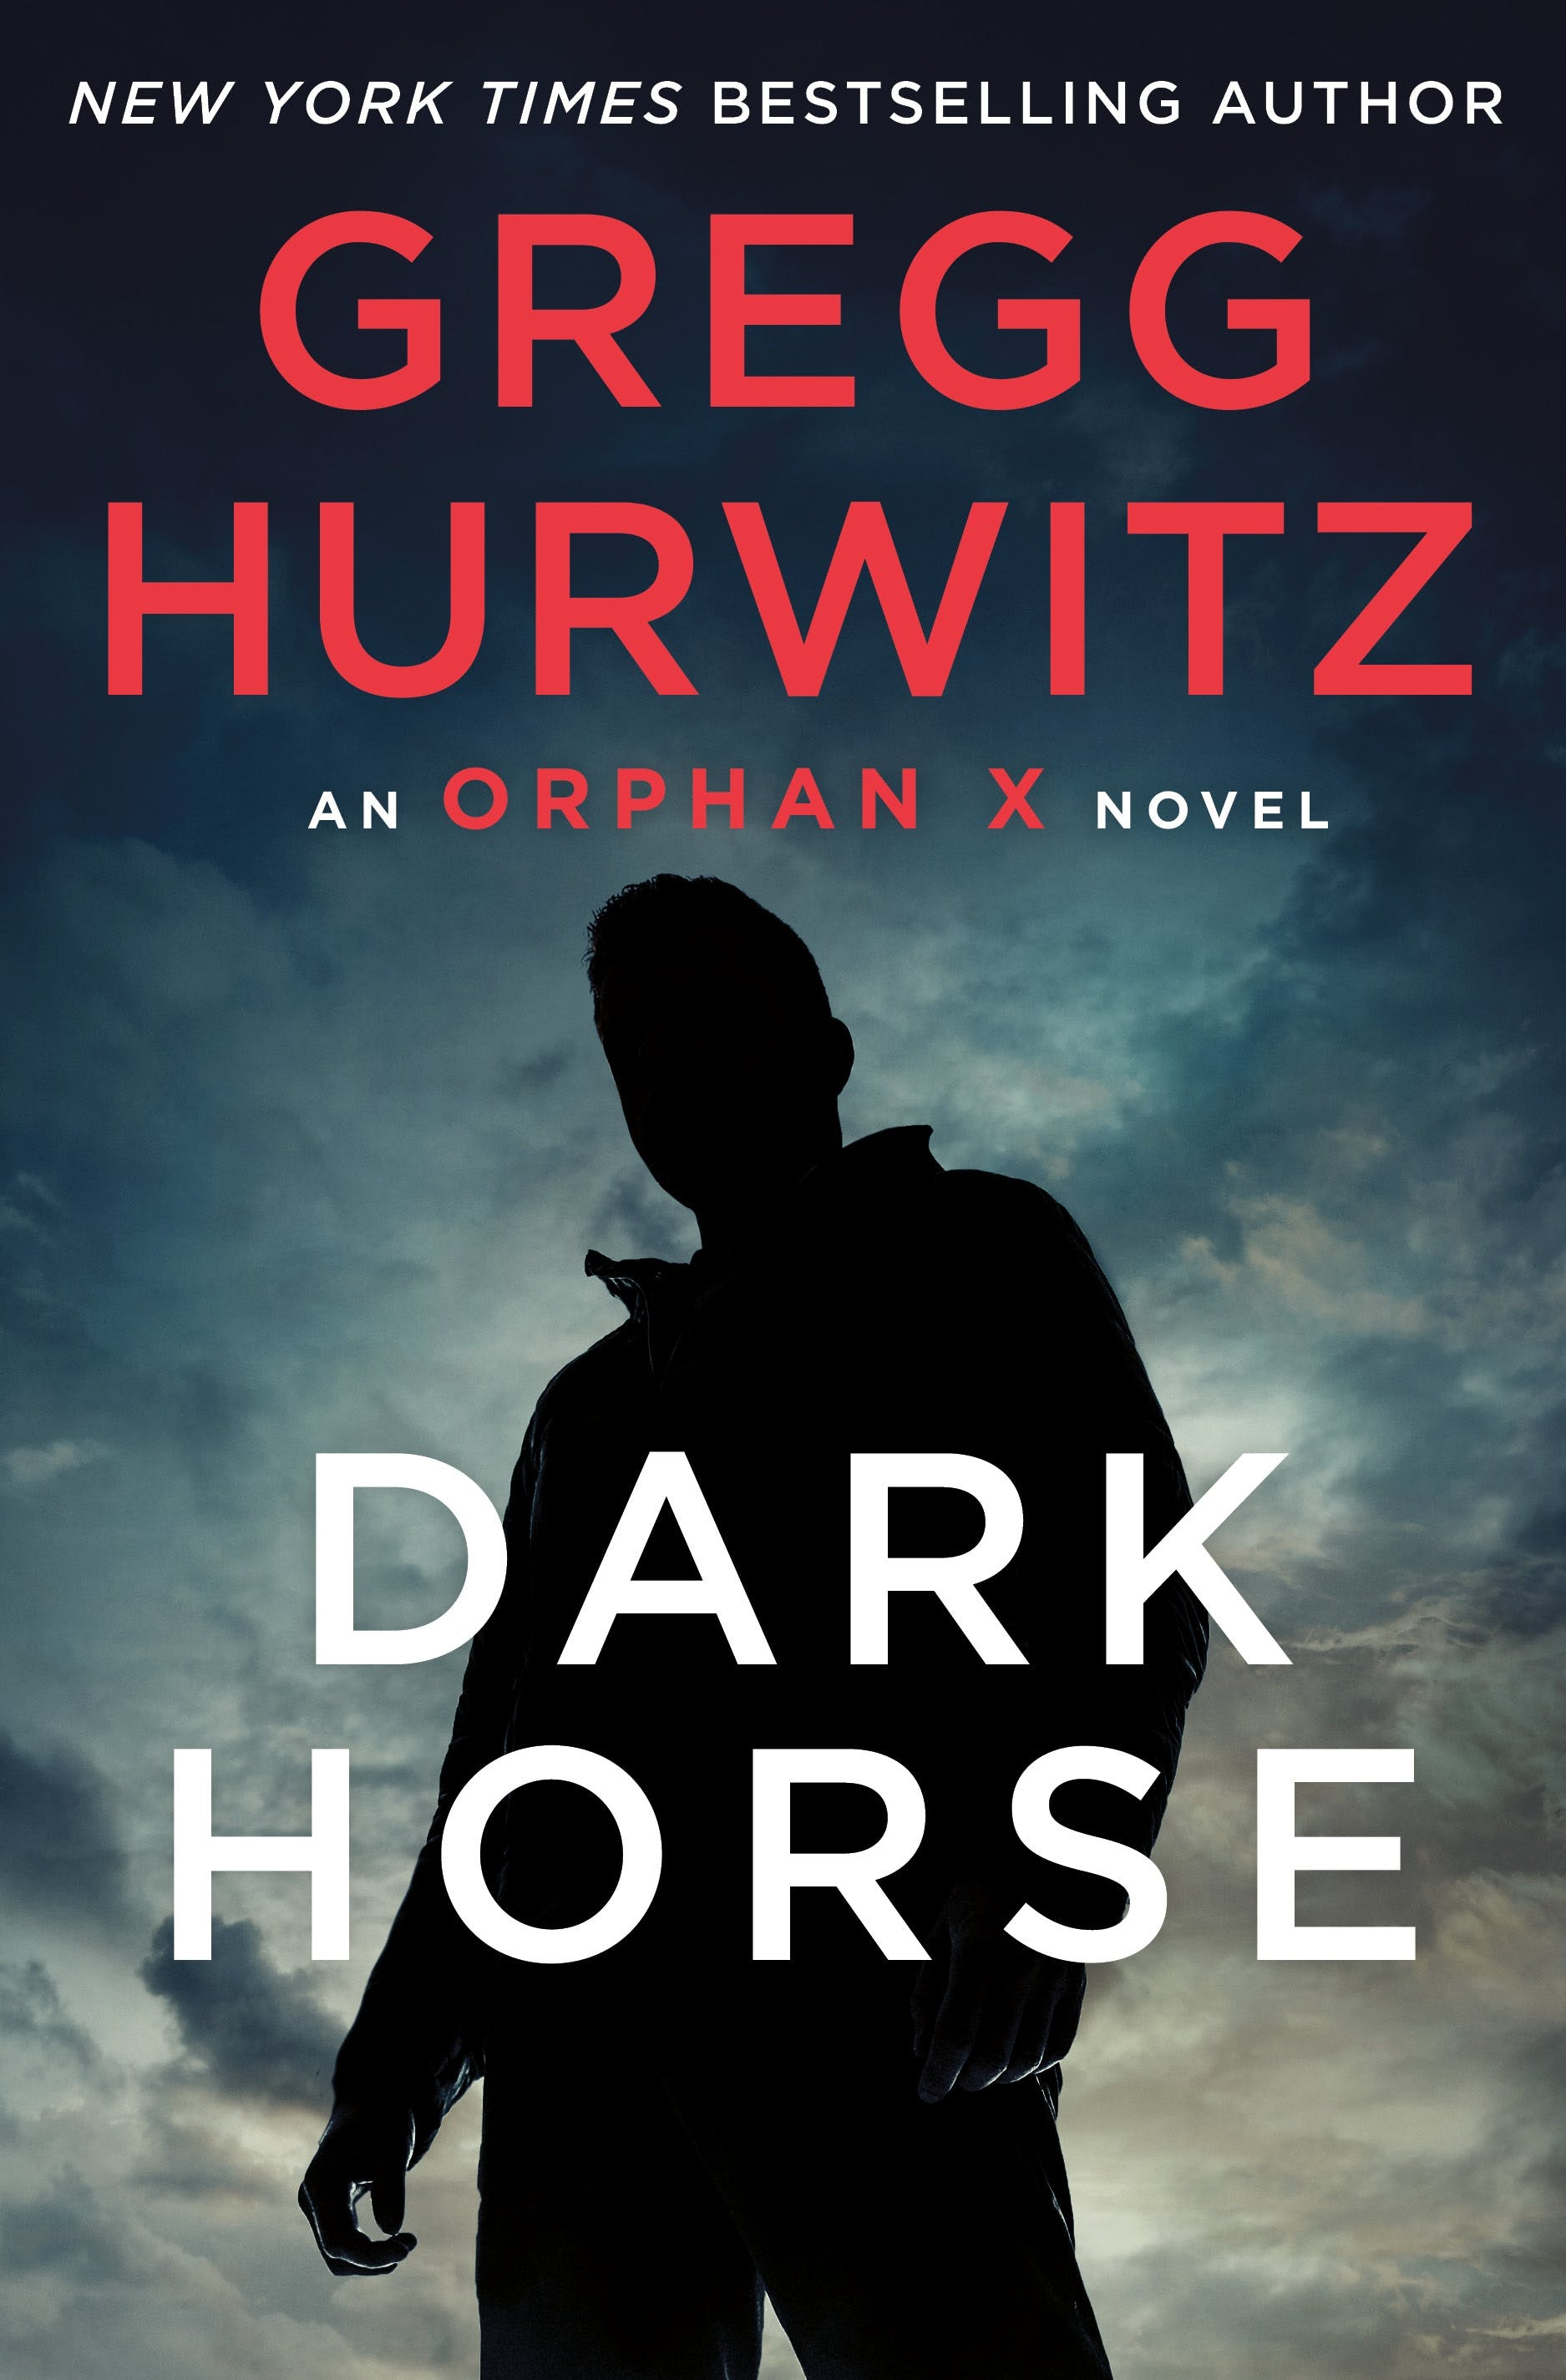 Image of Dark Horse